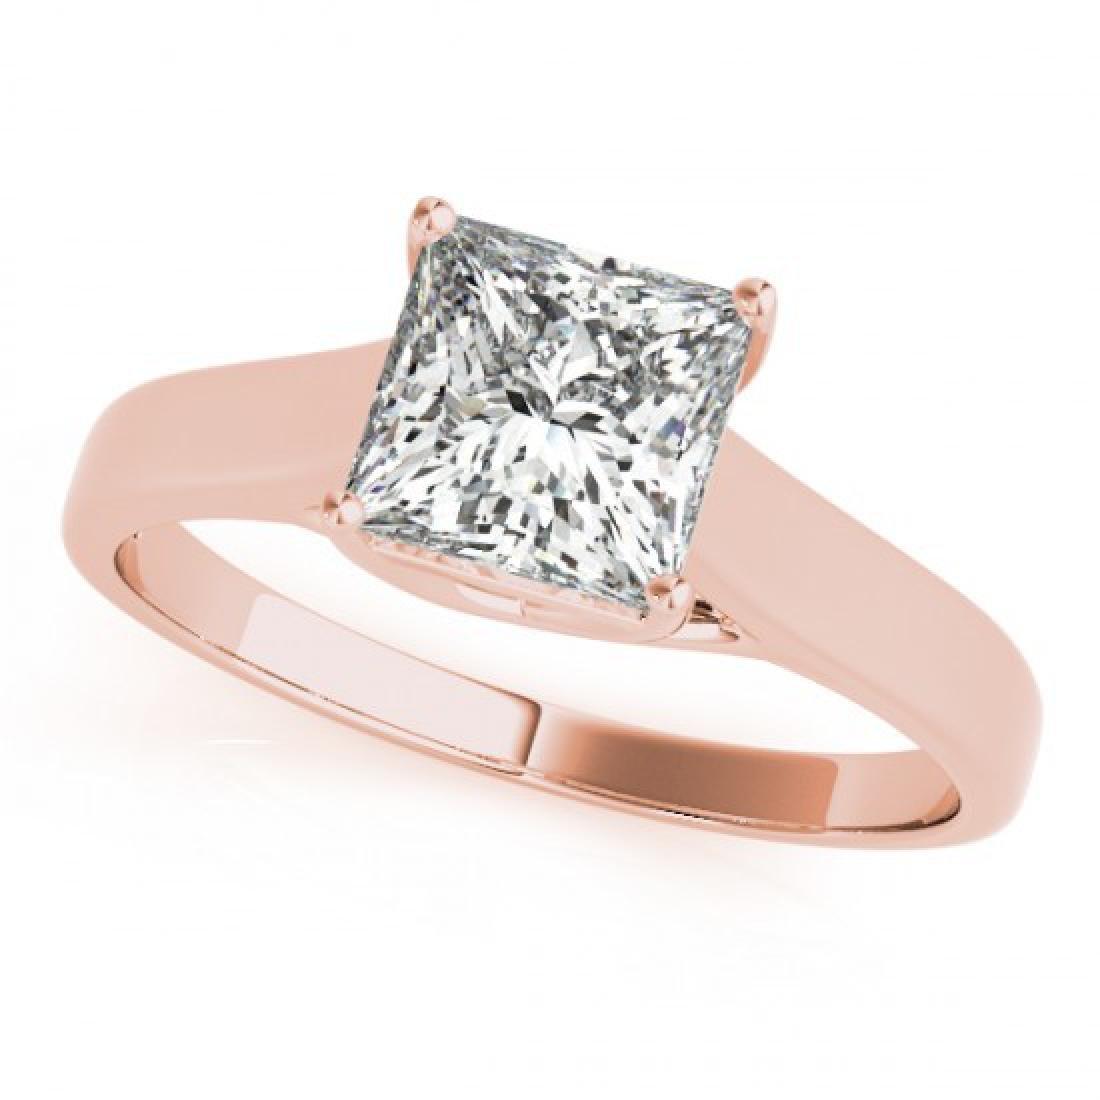 0.75 CTW Certified VS/SI Princess Diamond Ring 14K Rose - 2